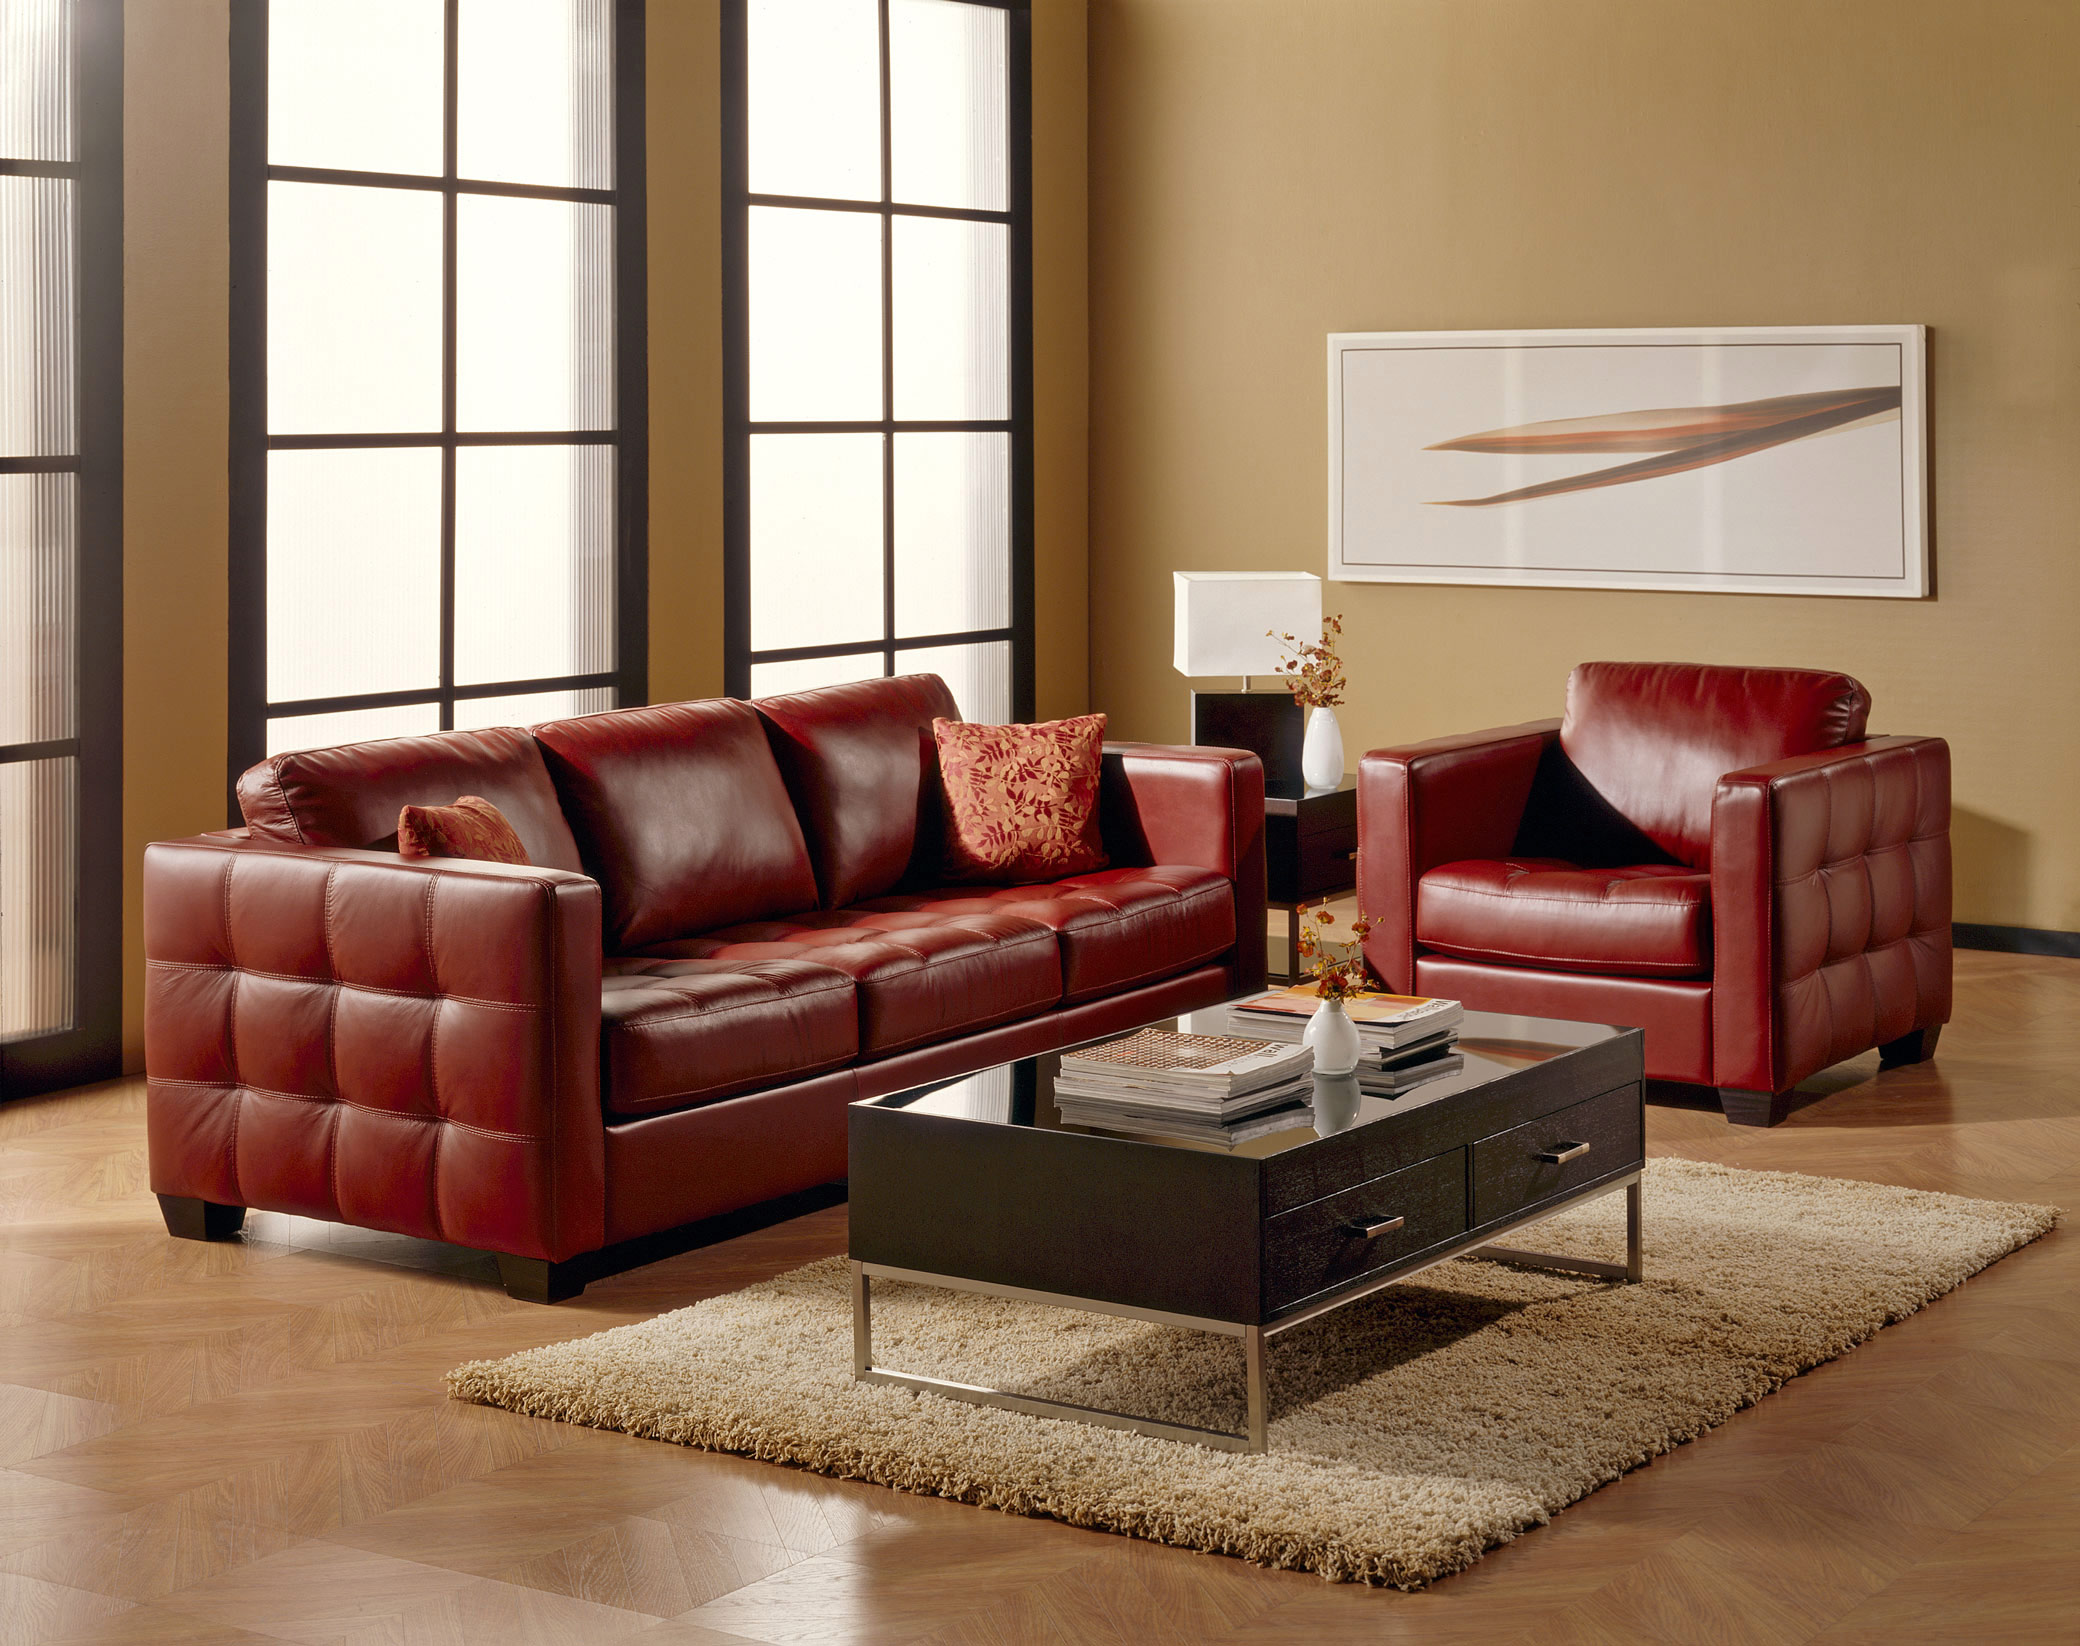 Barrett Leather Sofa 183 Leather Express Furniture